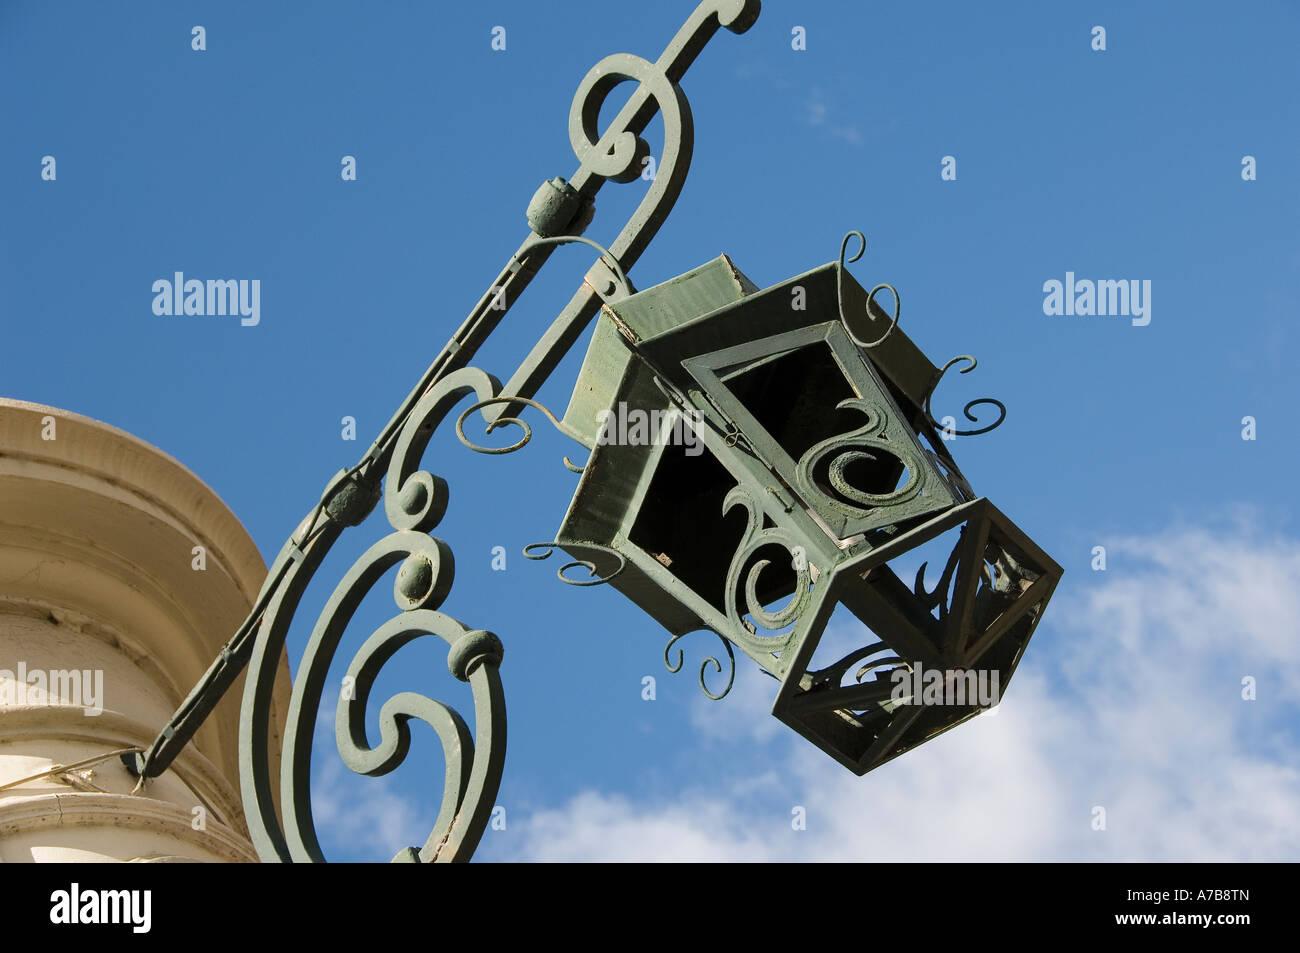 Ornate lamp Funchal Madeira Portugal EU Europe - Stock Image